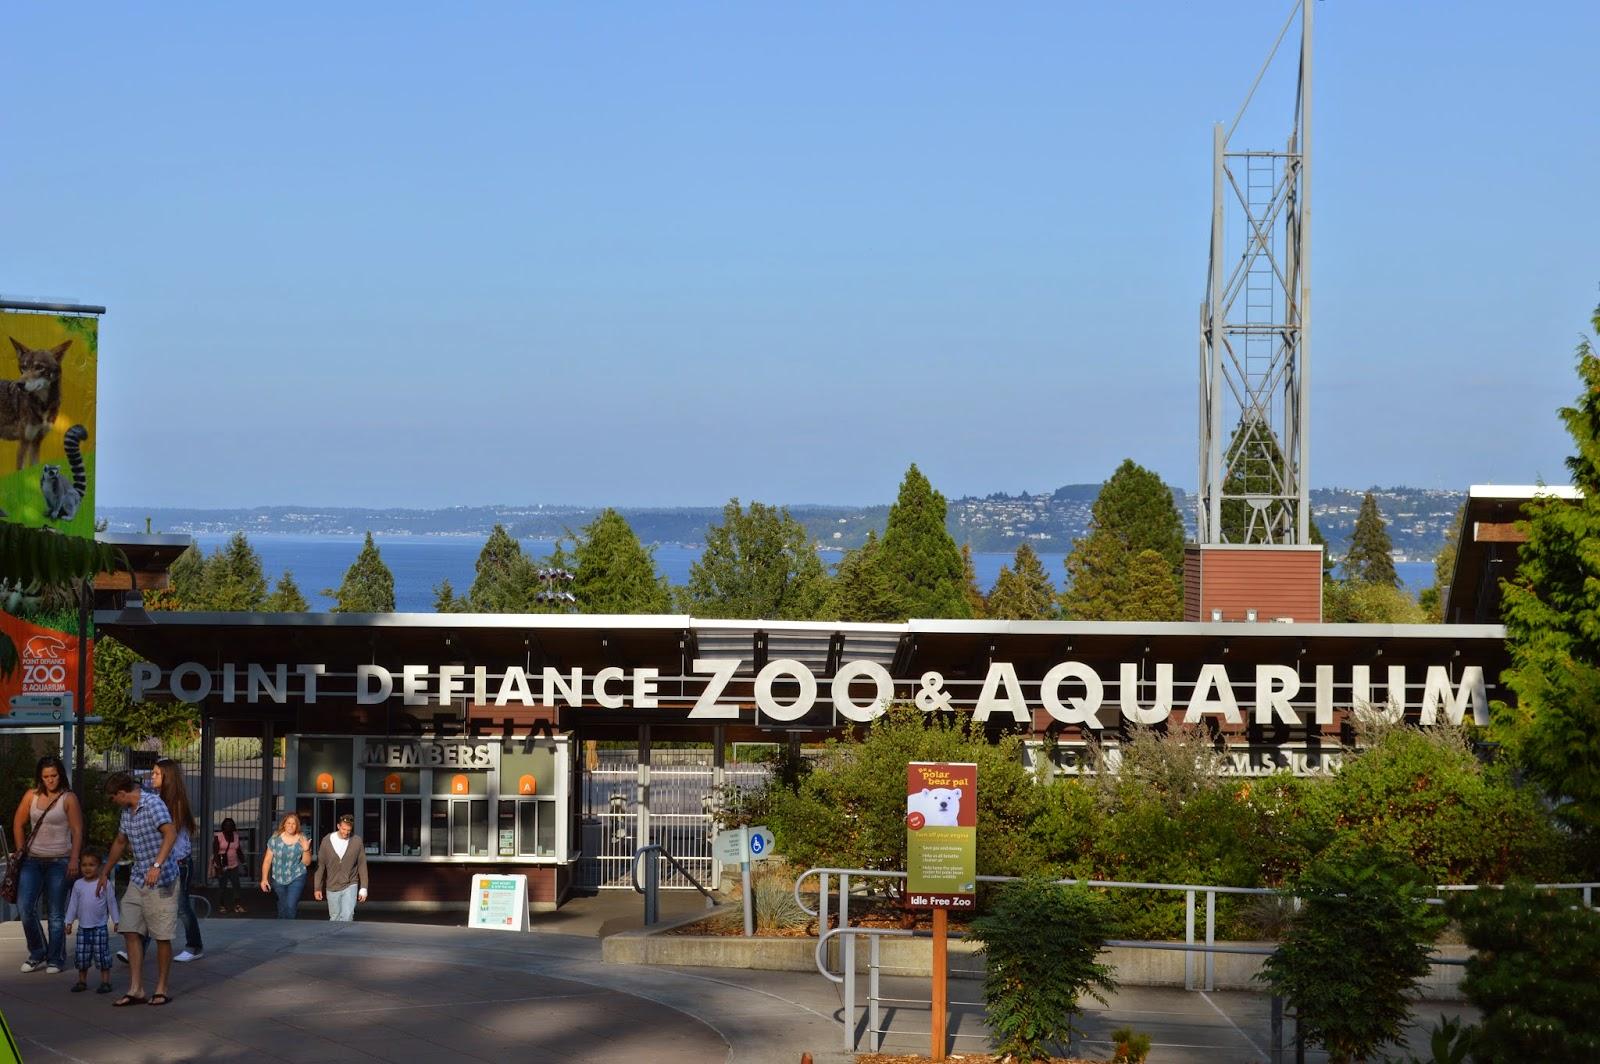 Point Defiance Zoo and Aquarium-Summer 2014